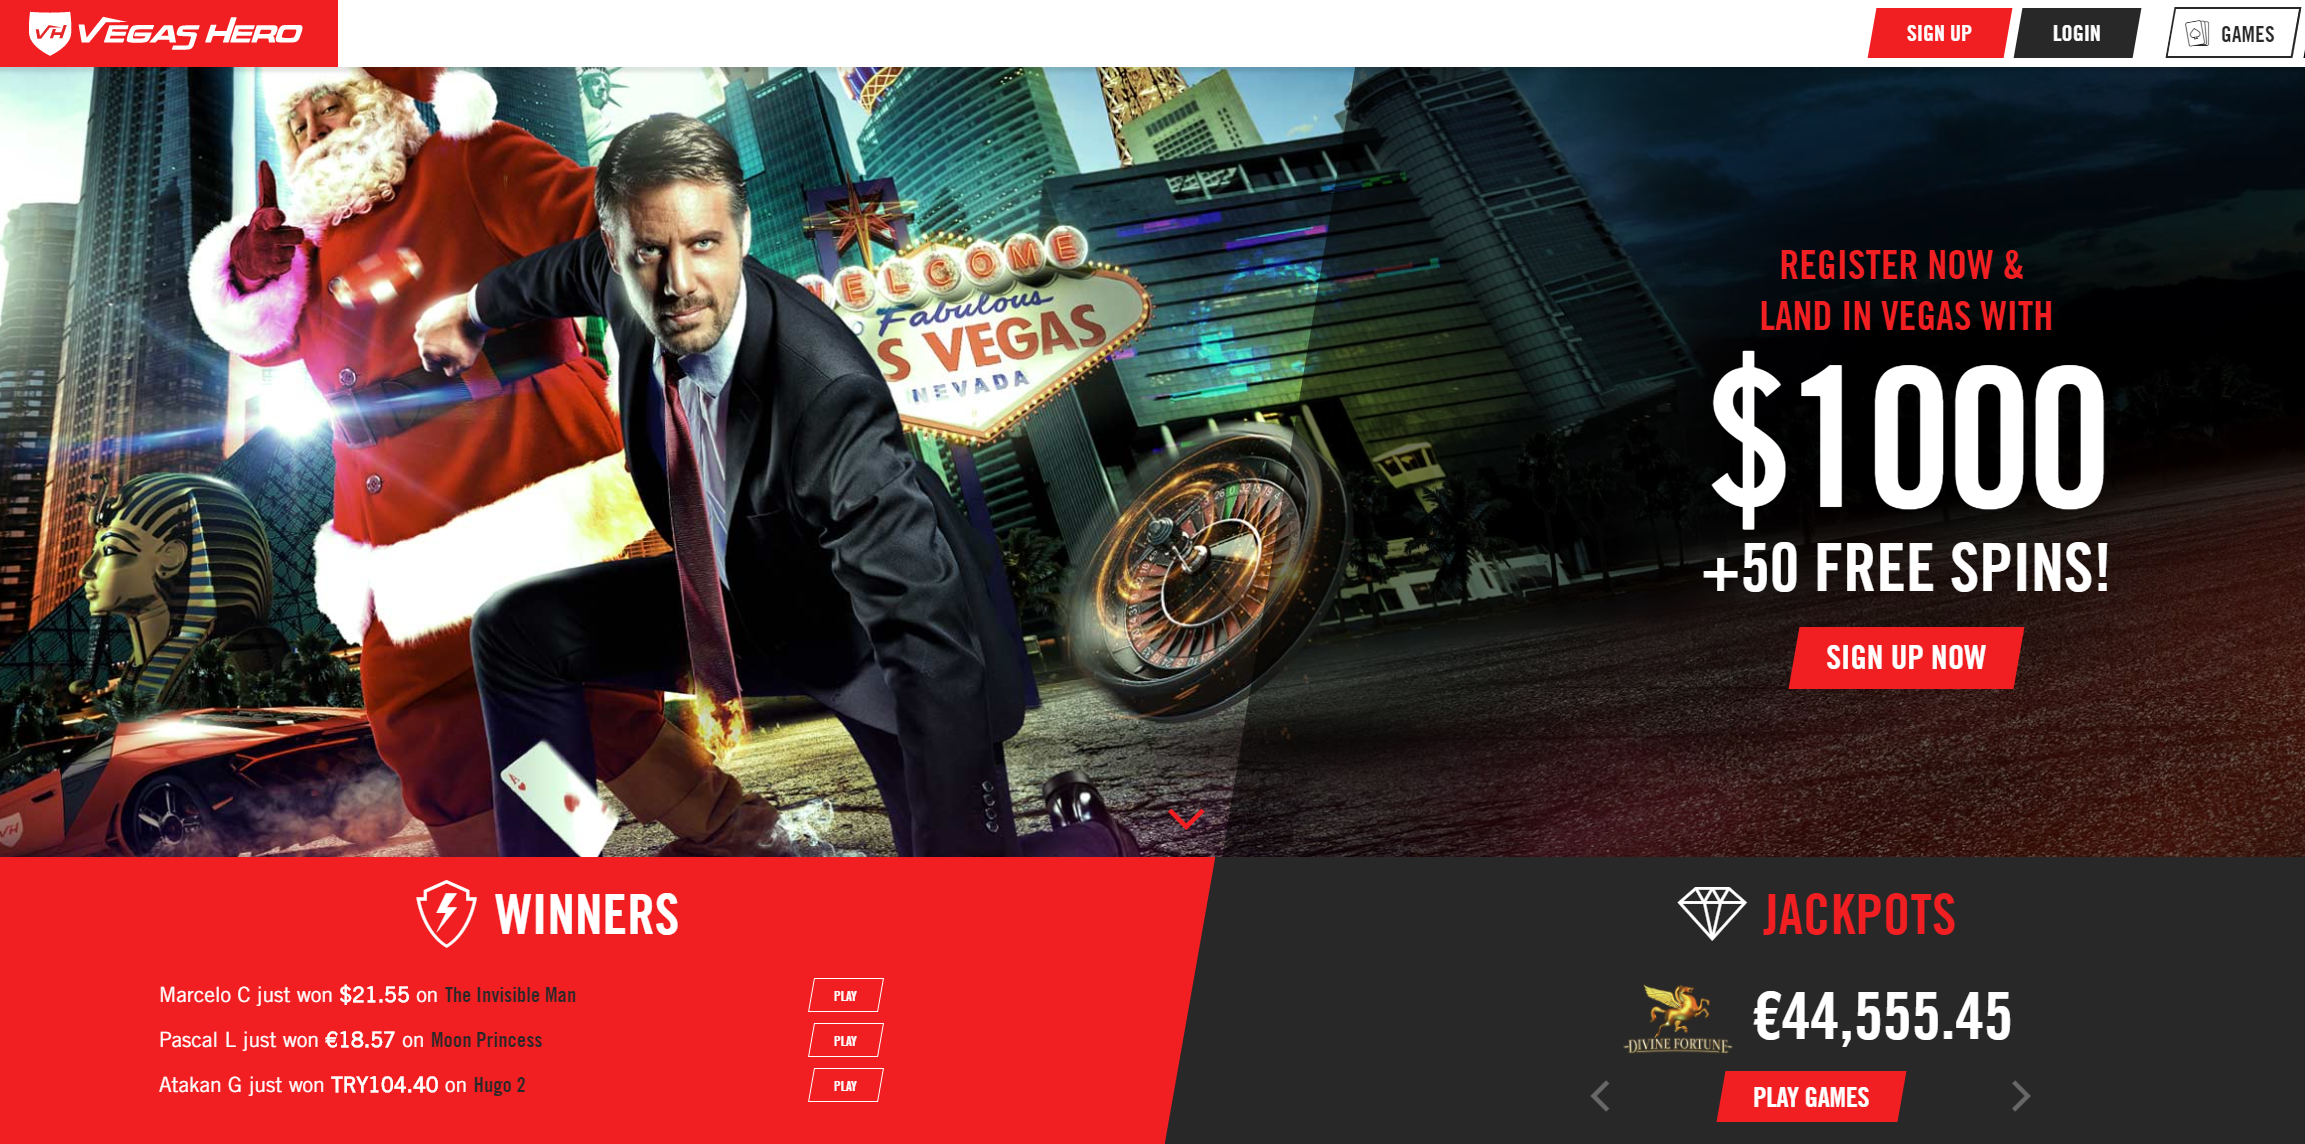 Vegashero Casino Wlecome Match Up Deposit Bonus